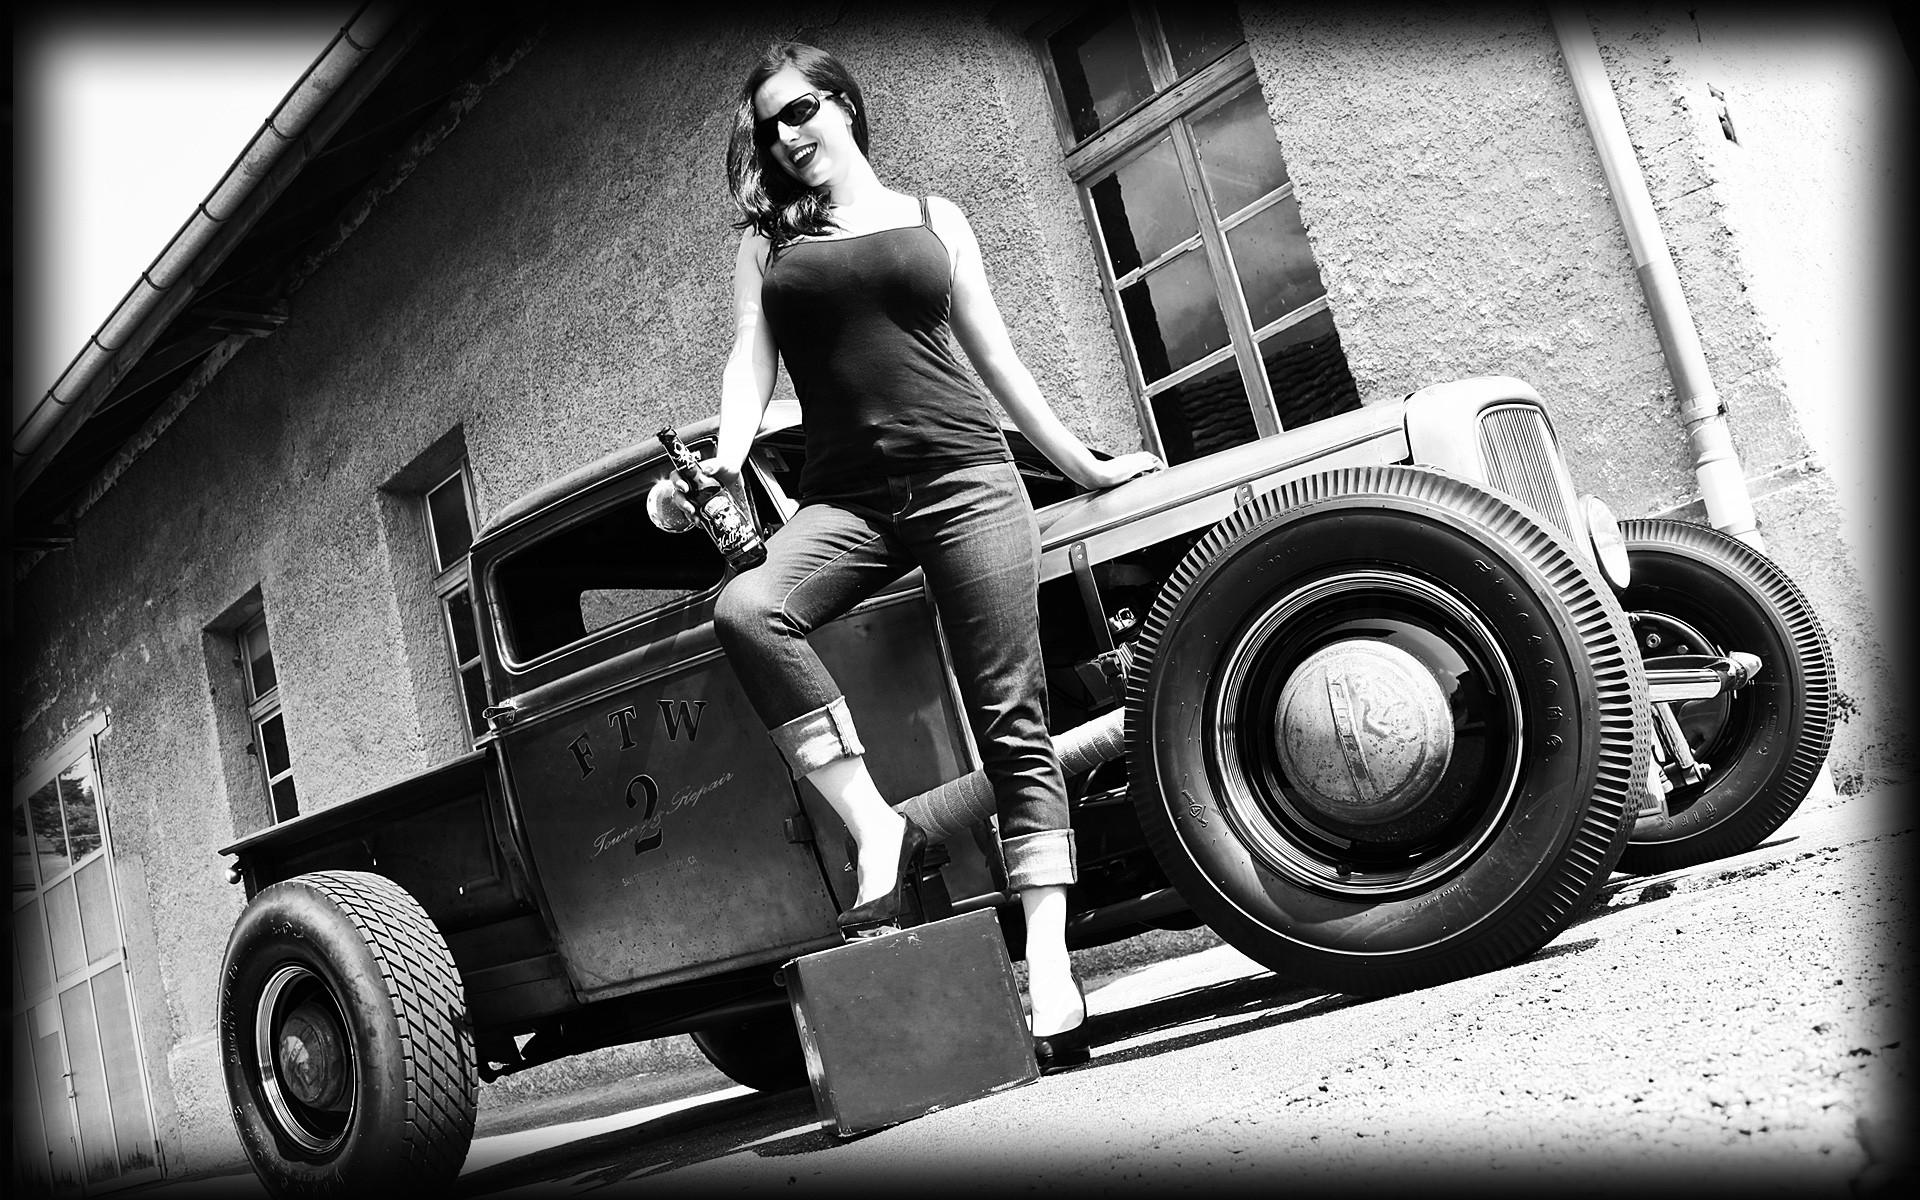 vehicles cars auto hot rod rat classic retro old wheels black white 1920x1200